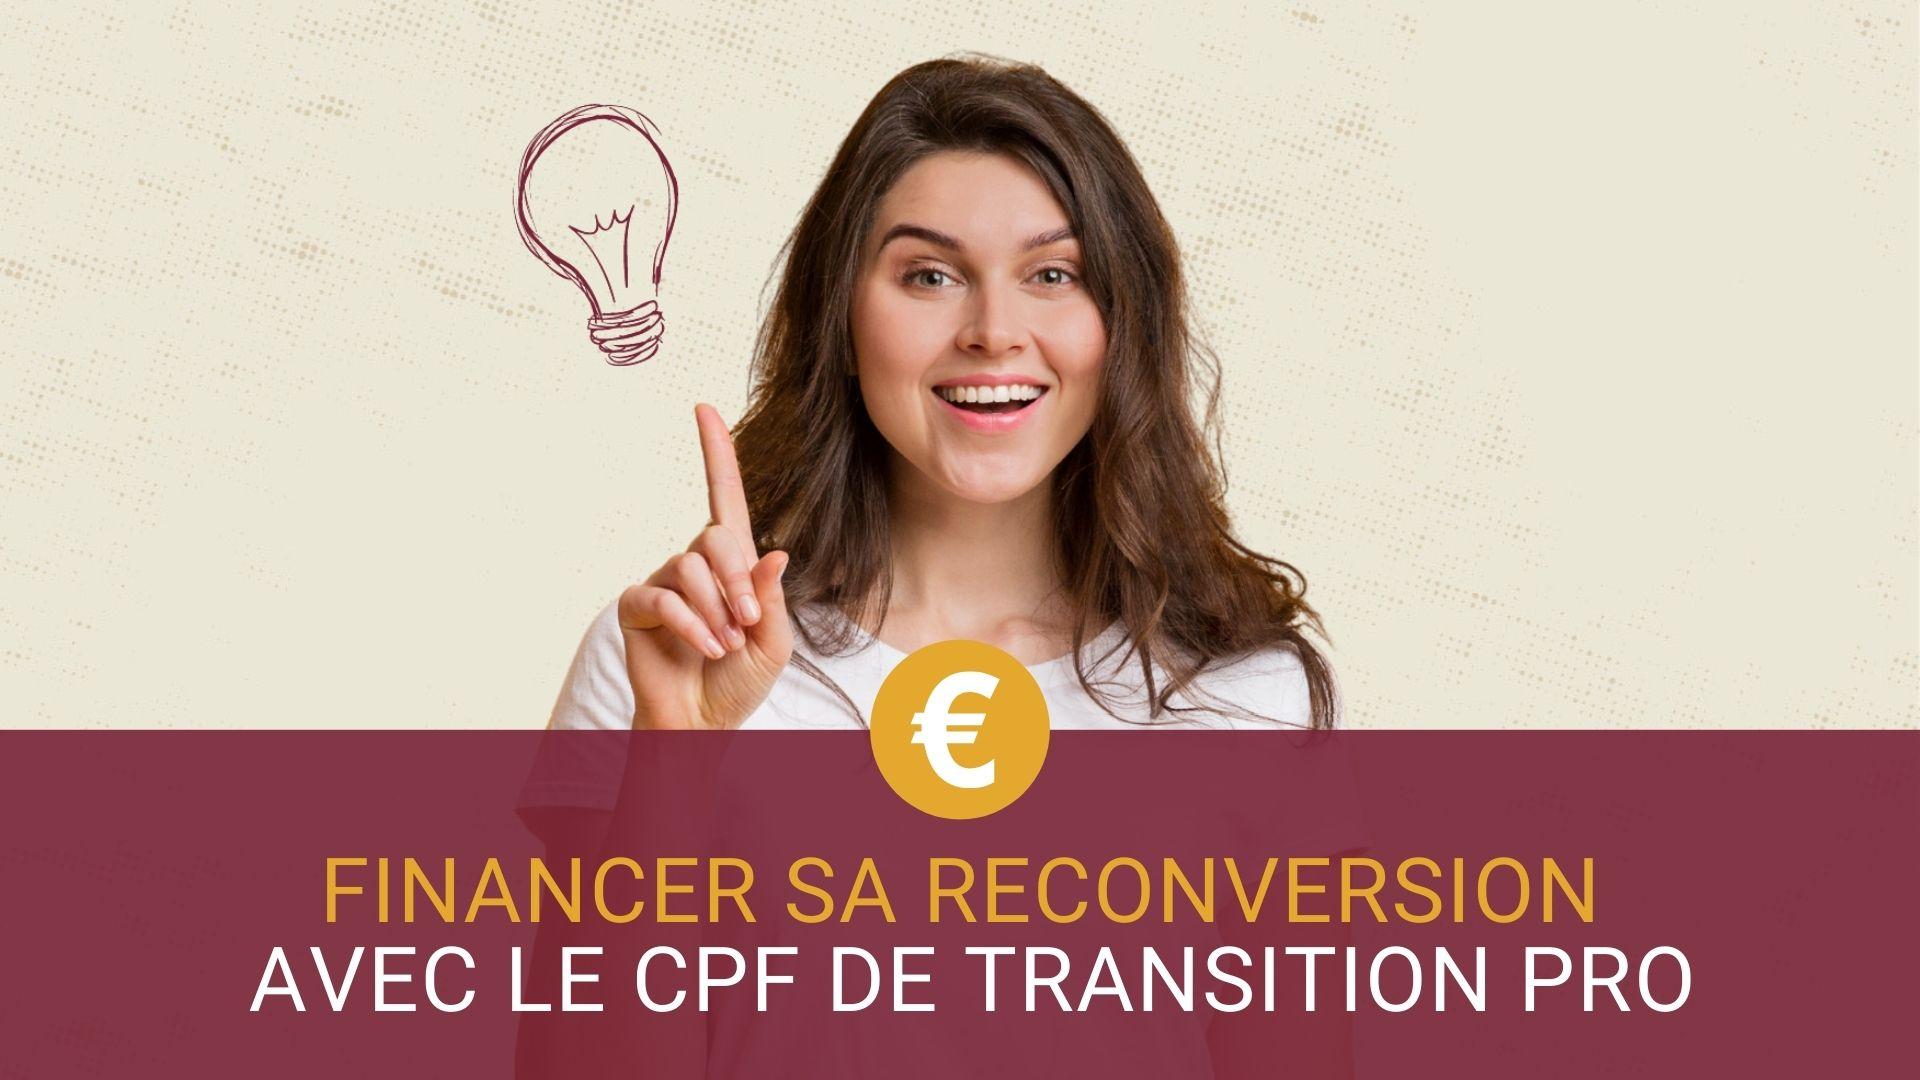 reconversion financement cpf de transition pro